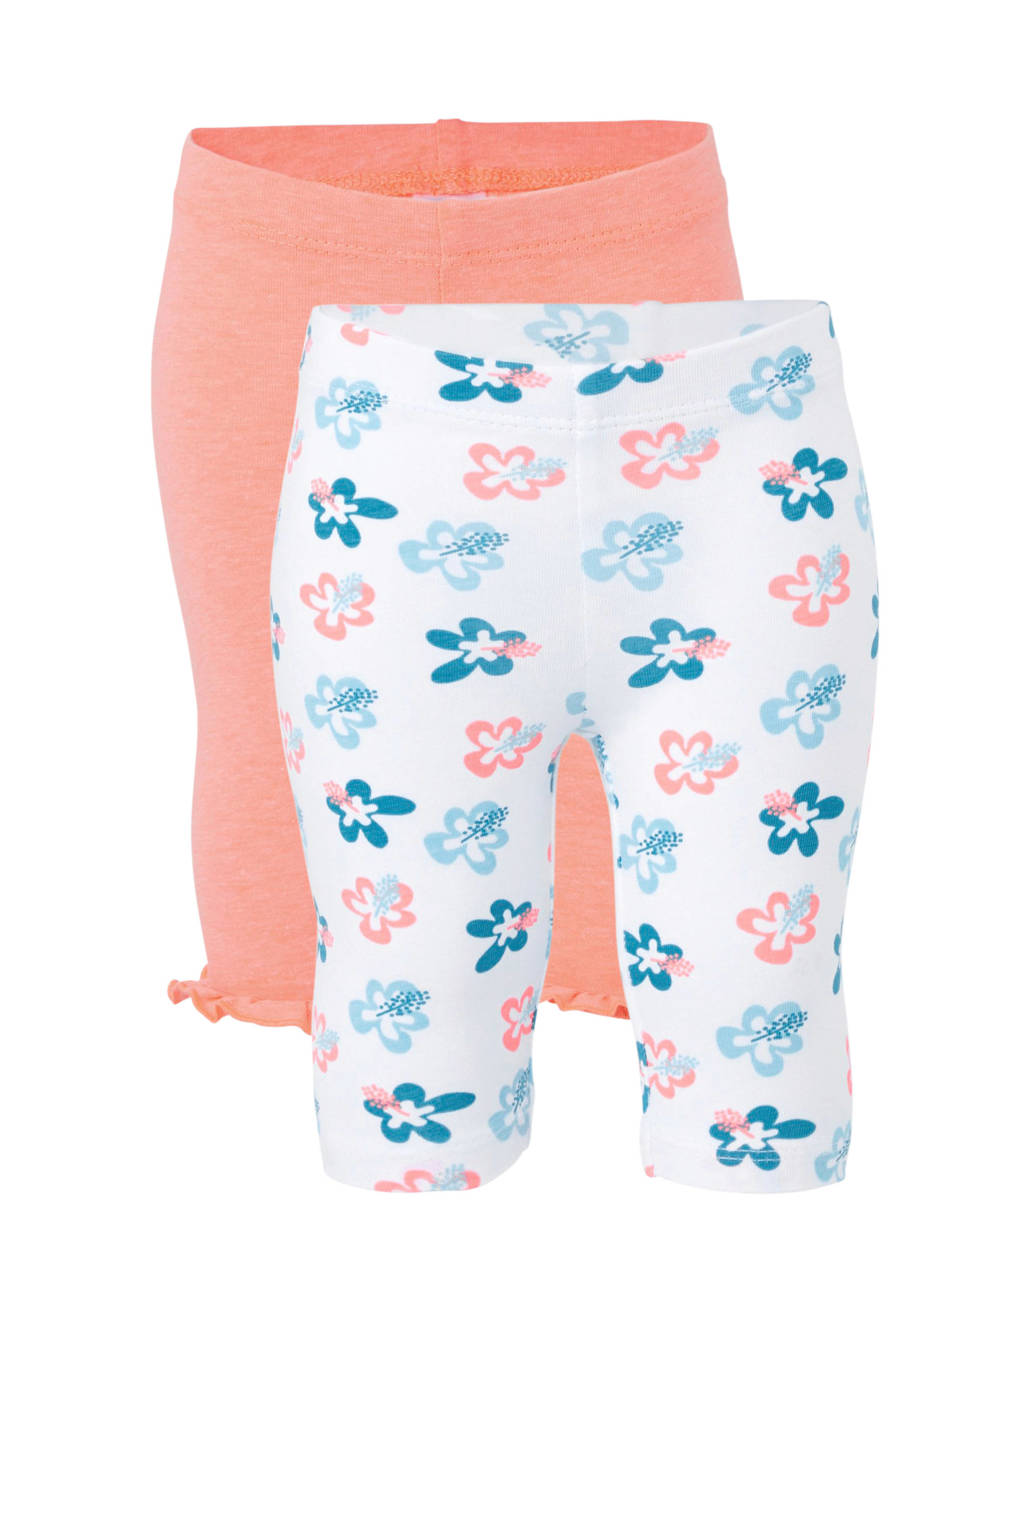 C&A Baby Club legging - set van 2, Wit/oranje